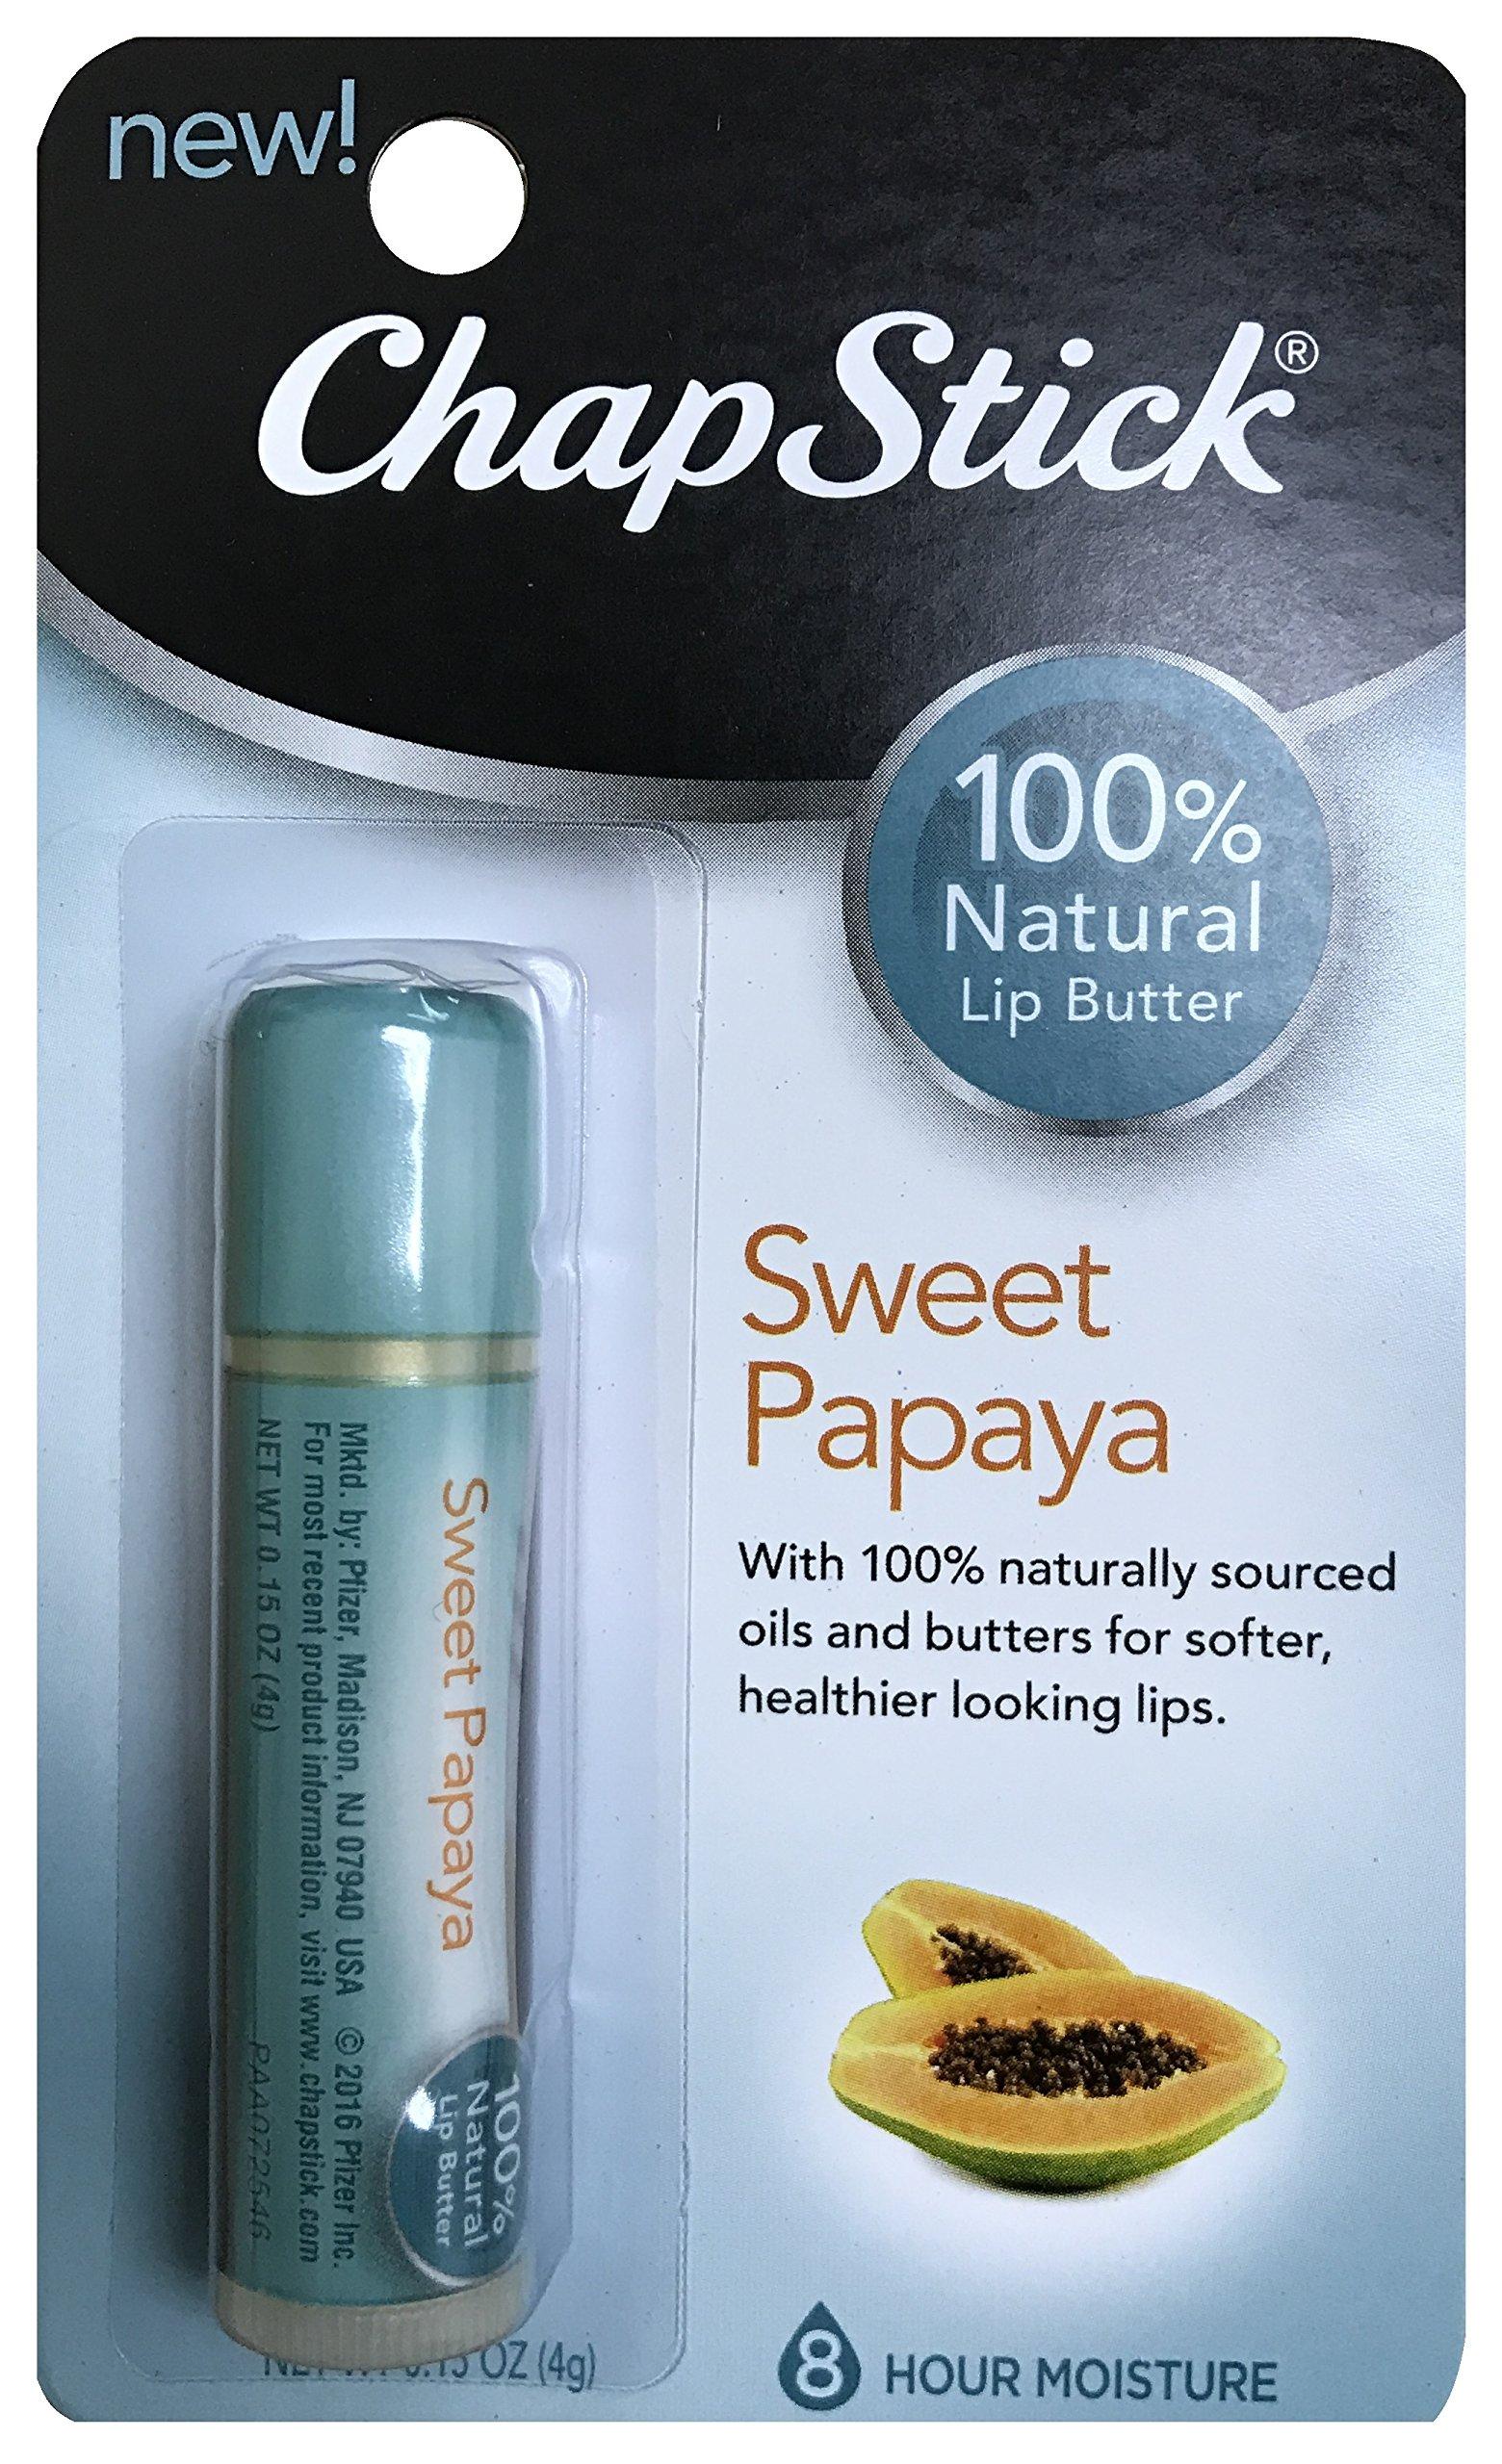 ChapStick 100% Natural Lip Butter Sweet Papaya 0.15 oz (Pack of 12)